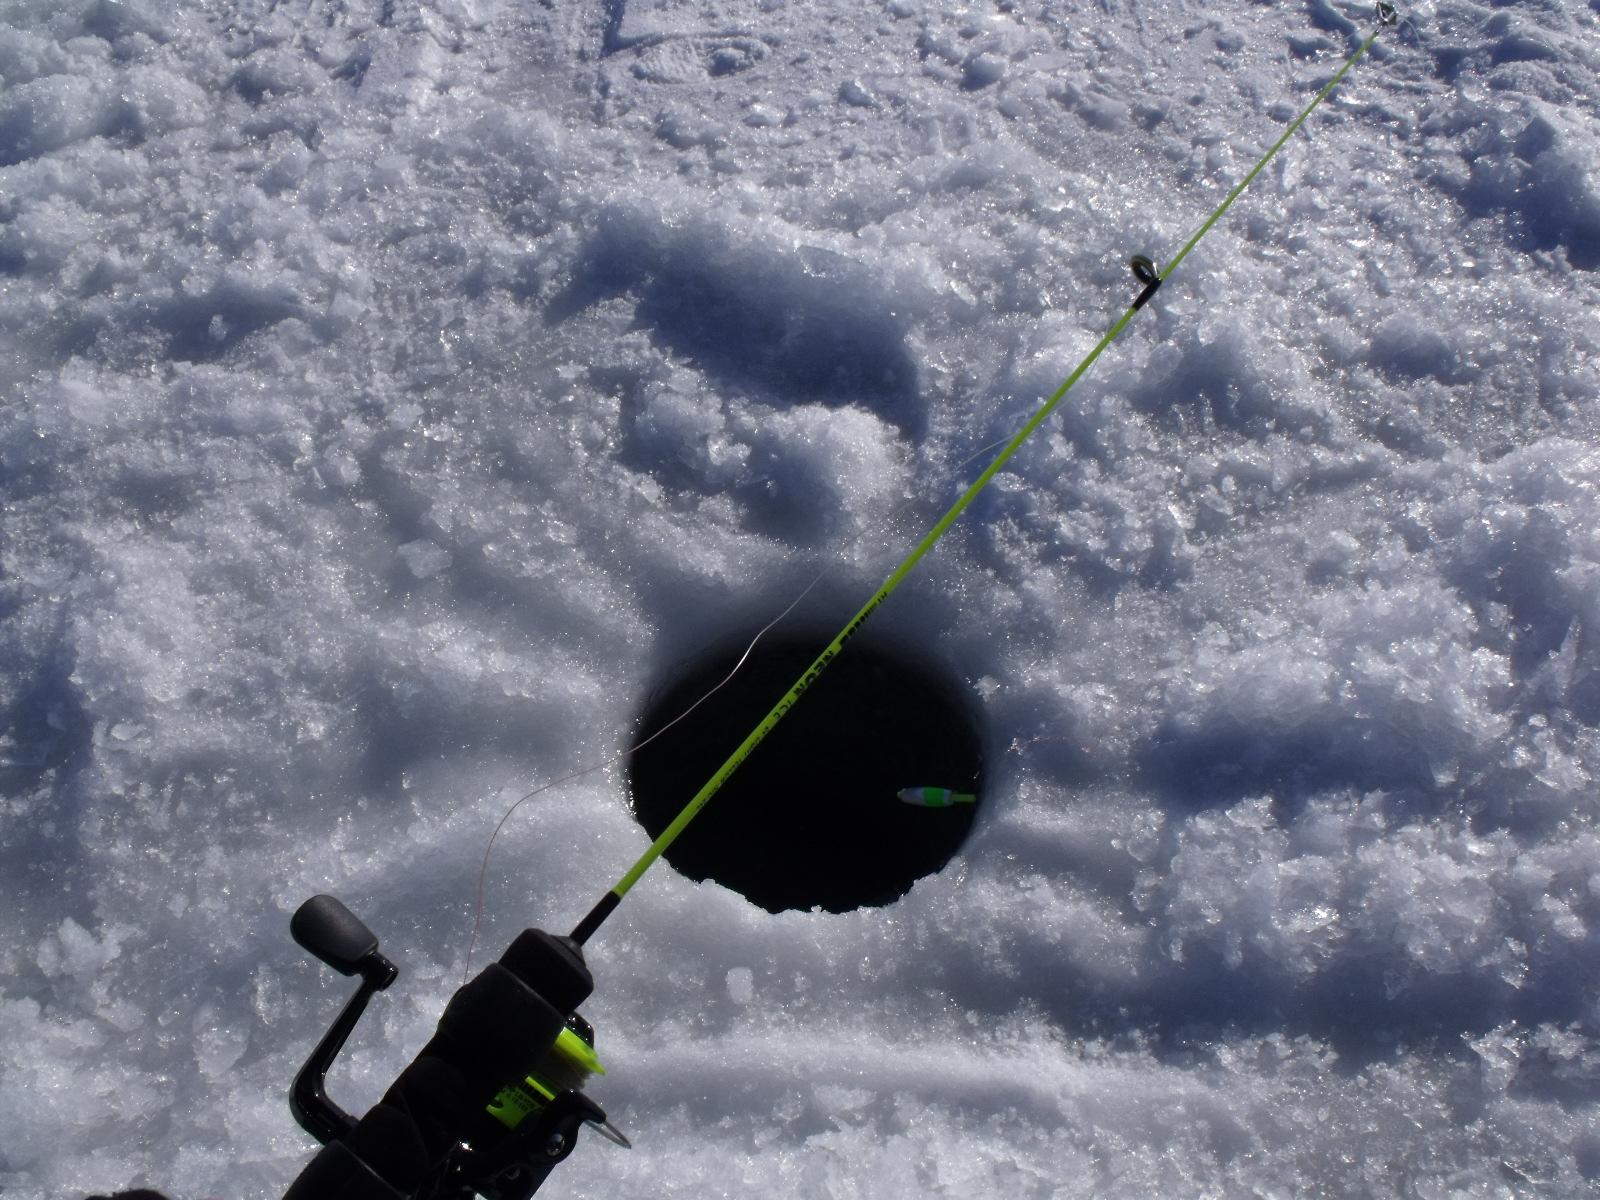 Ice fishing a minnesota tradition callens honey farm for Ice fishing hole